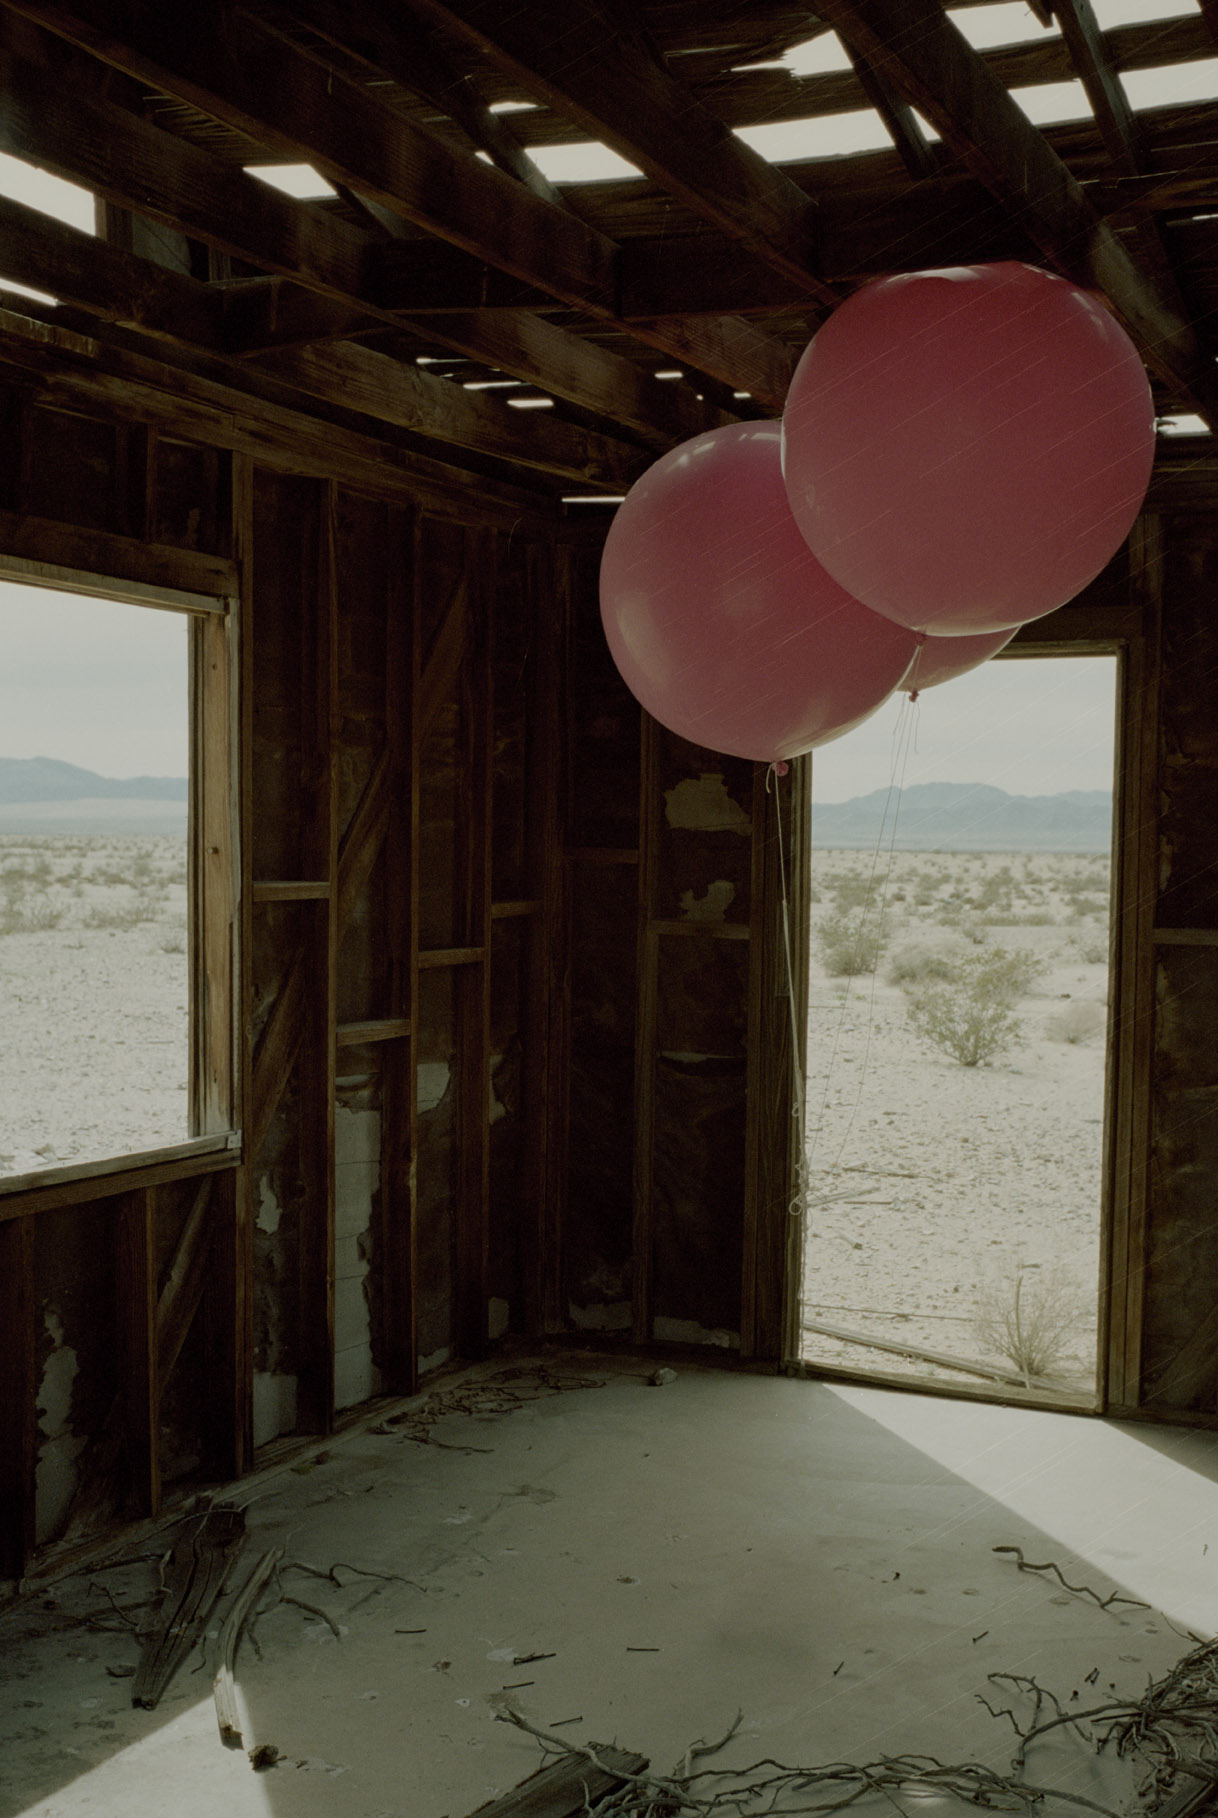 Balloons6.jpg